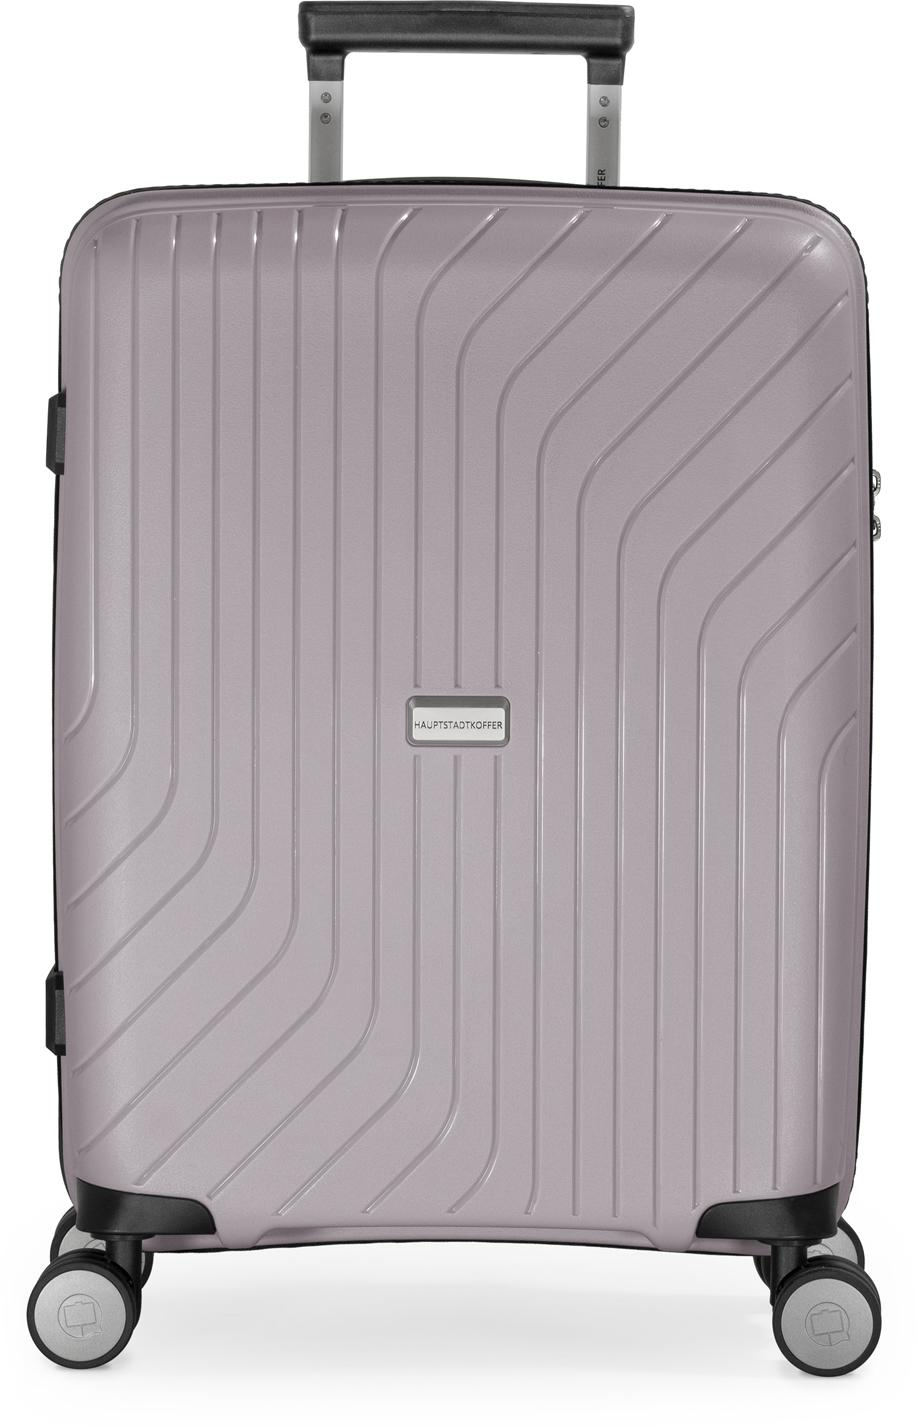 Hauptstadtkoffer Hartschalen-Trolley TXL, vintage silber, 55 cm, 4 Rollen | Taschen > Koffer & Trolleys > Trolleys | hauptstadtkoffer